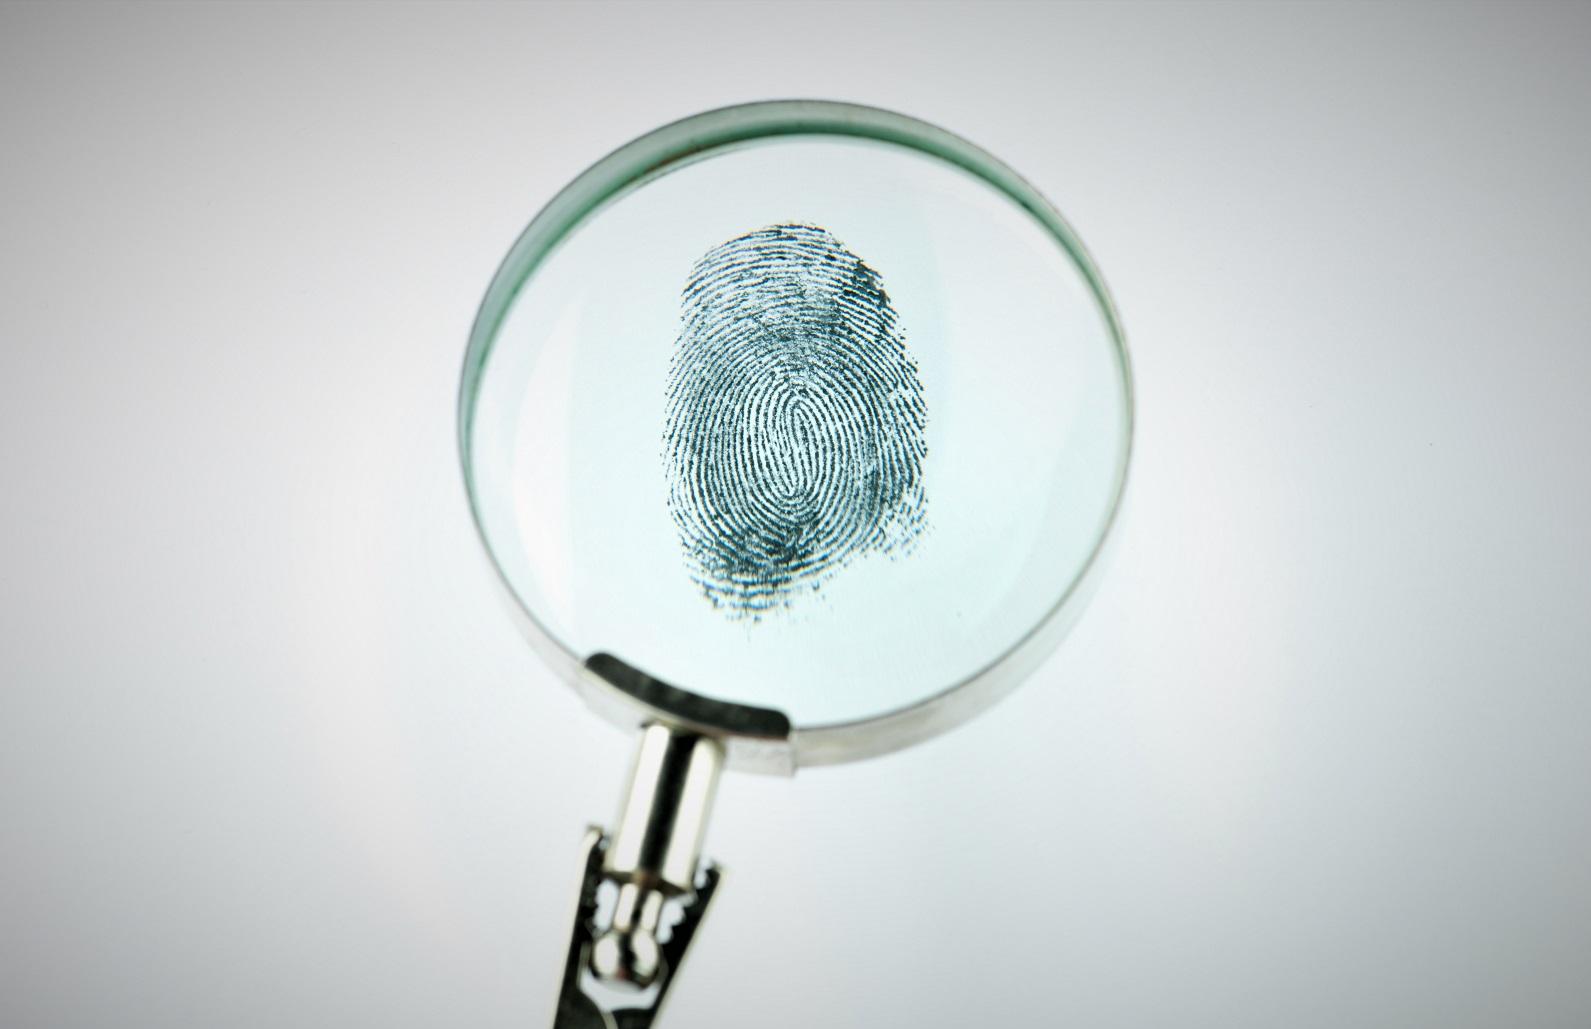 fingerprint through magnifying glass PFTHN66 Георгий Шакарашвили Георгий Шакарашвили